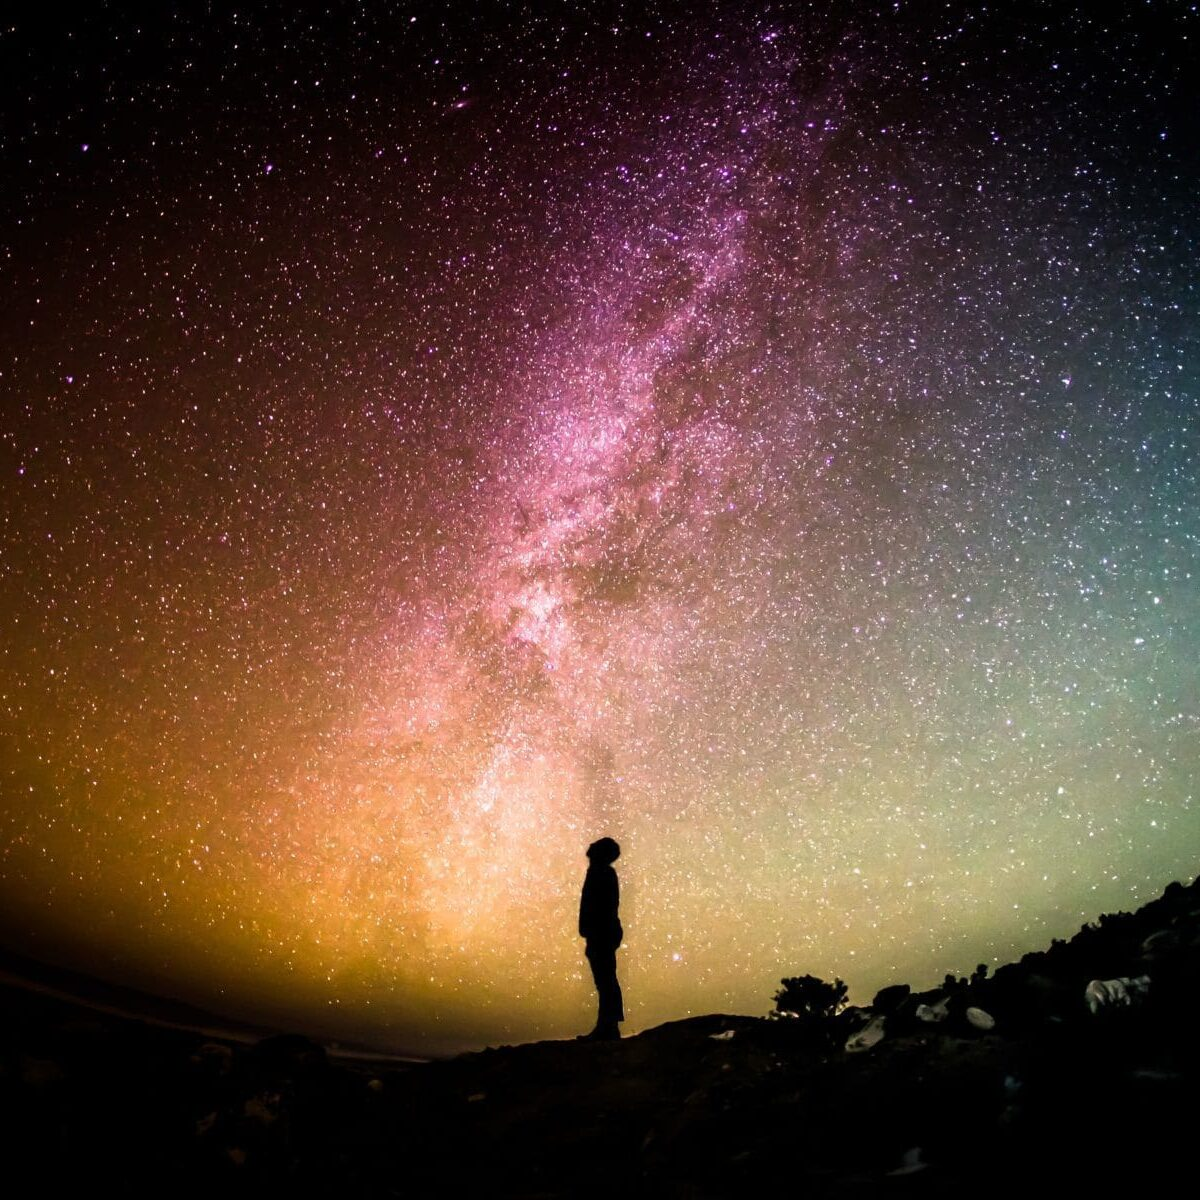 4. Cosmos - Y8CKB0O8C2